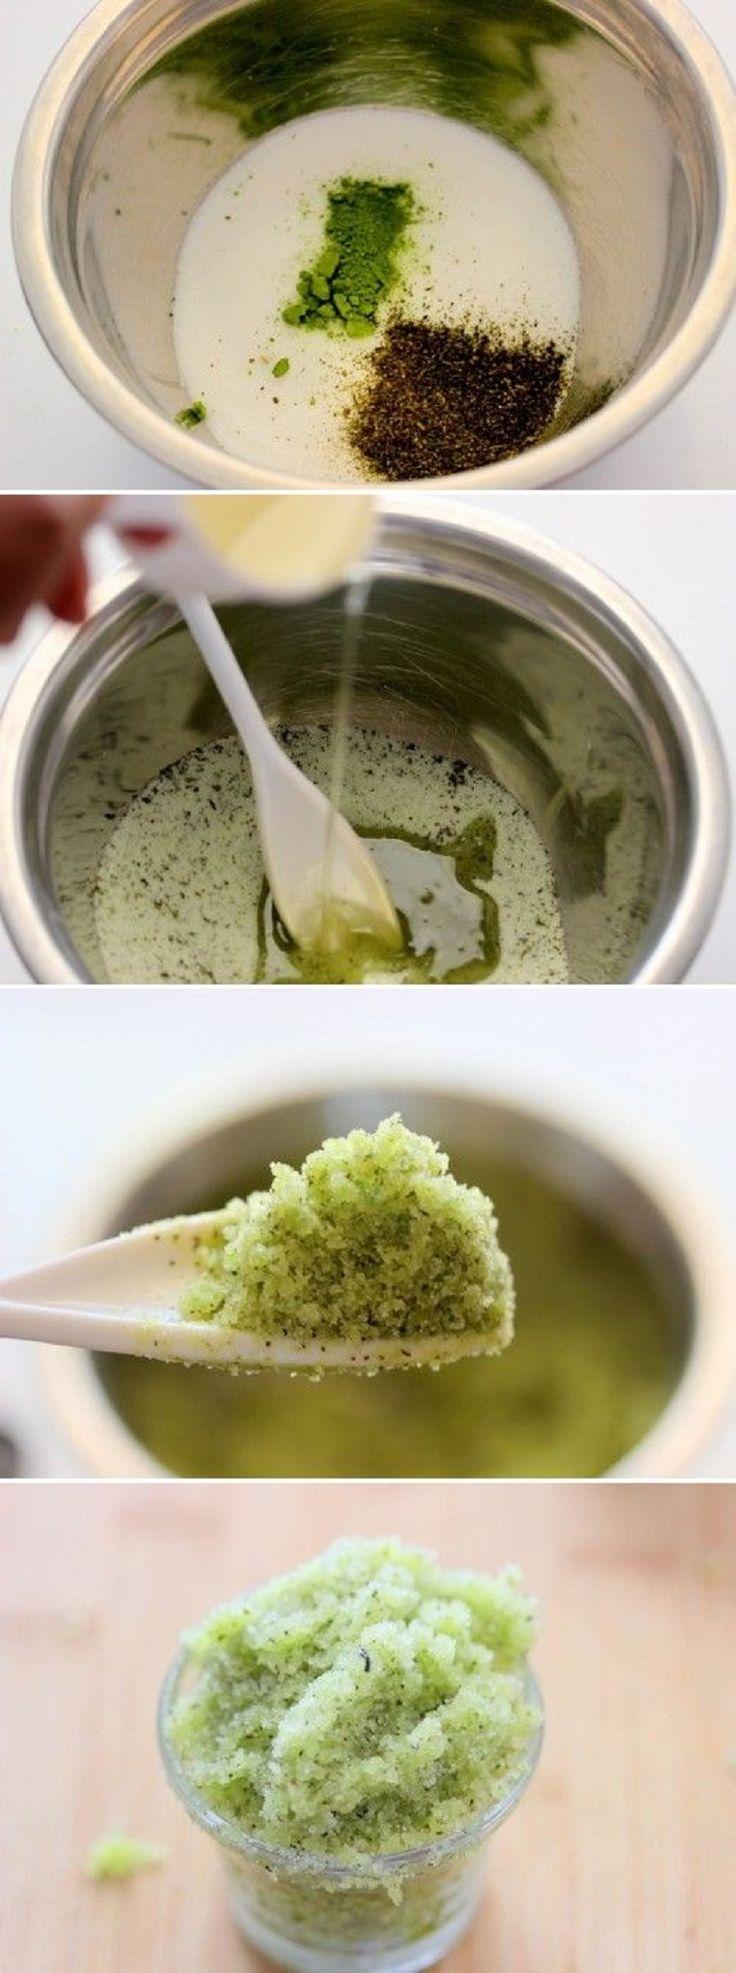 Green tea sugar scrub - 10 Homemade Green Tea Beauty Products